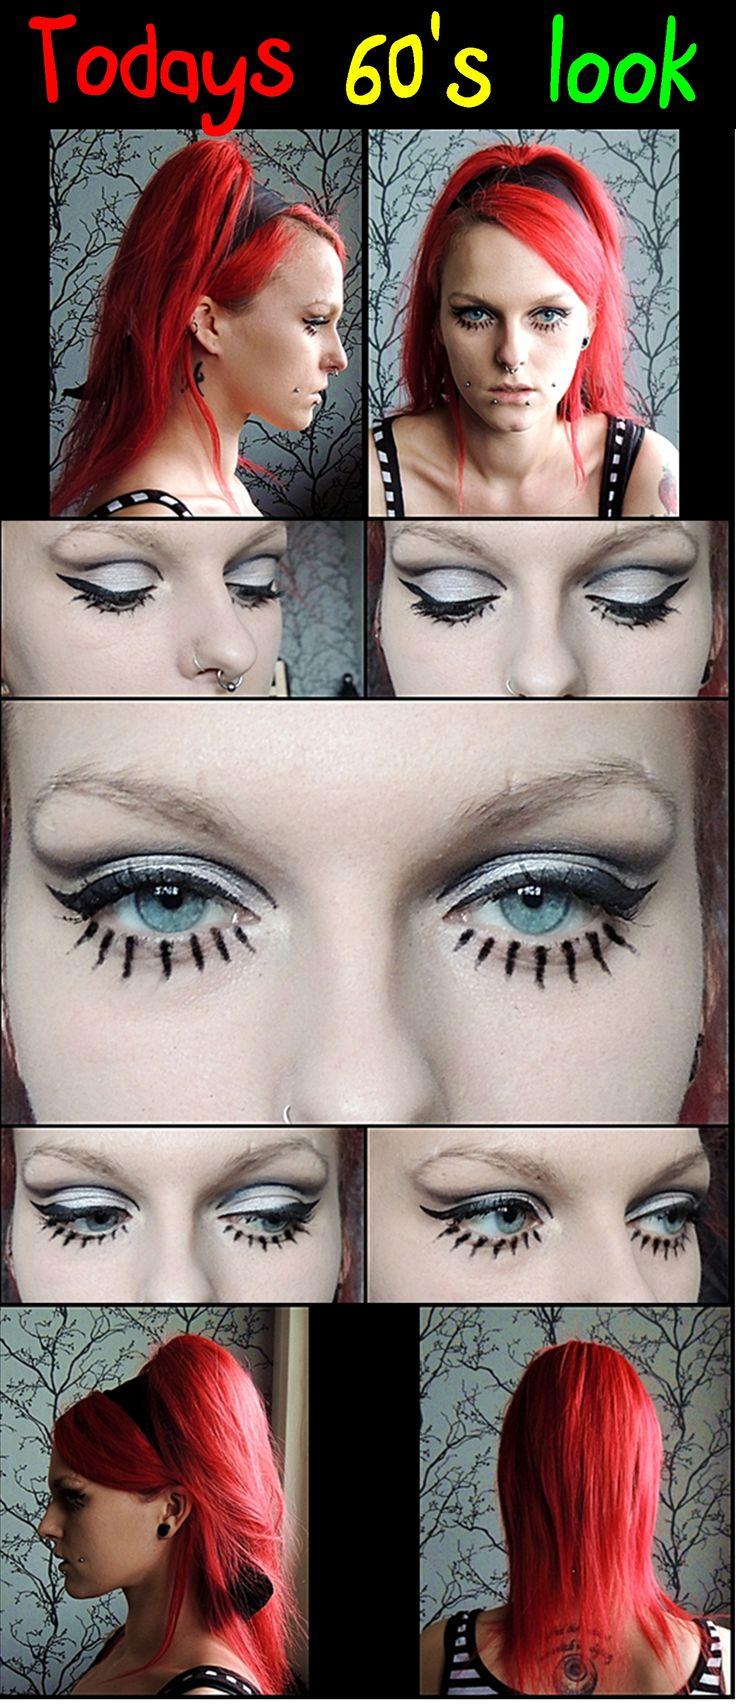 Dark, piercing, tattoo, Make up, weird, crazy,  redhead, red, black, 60's, hair, hair due, lashes, stripes, portrait, profile, neck, bones, color, eyes, branches, white